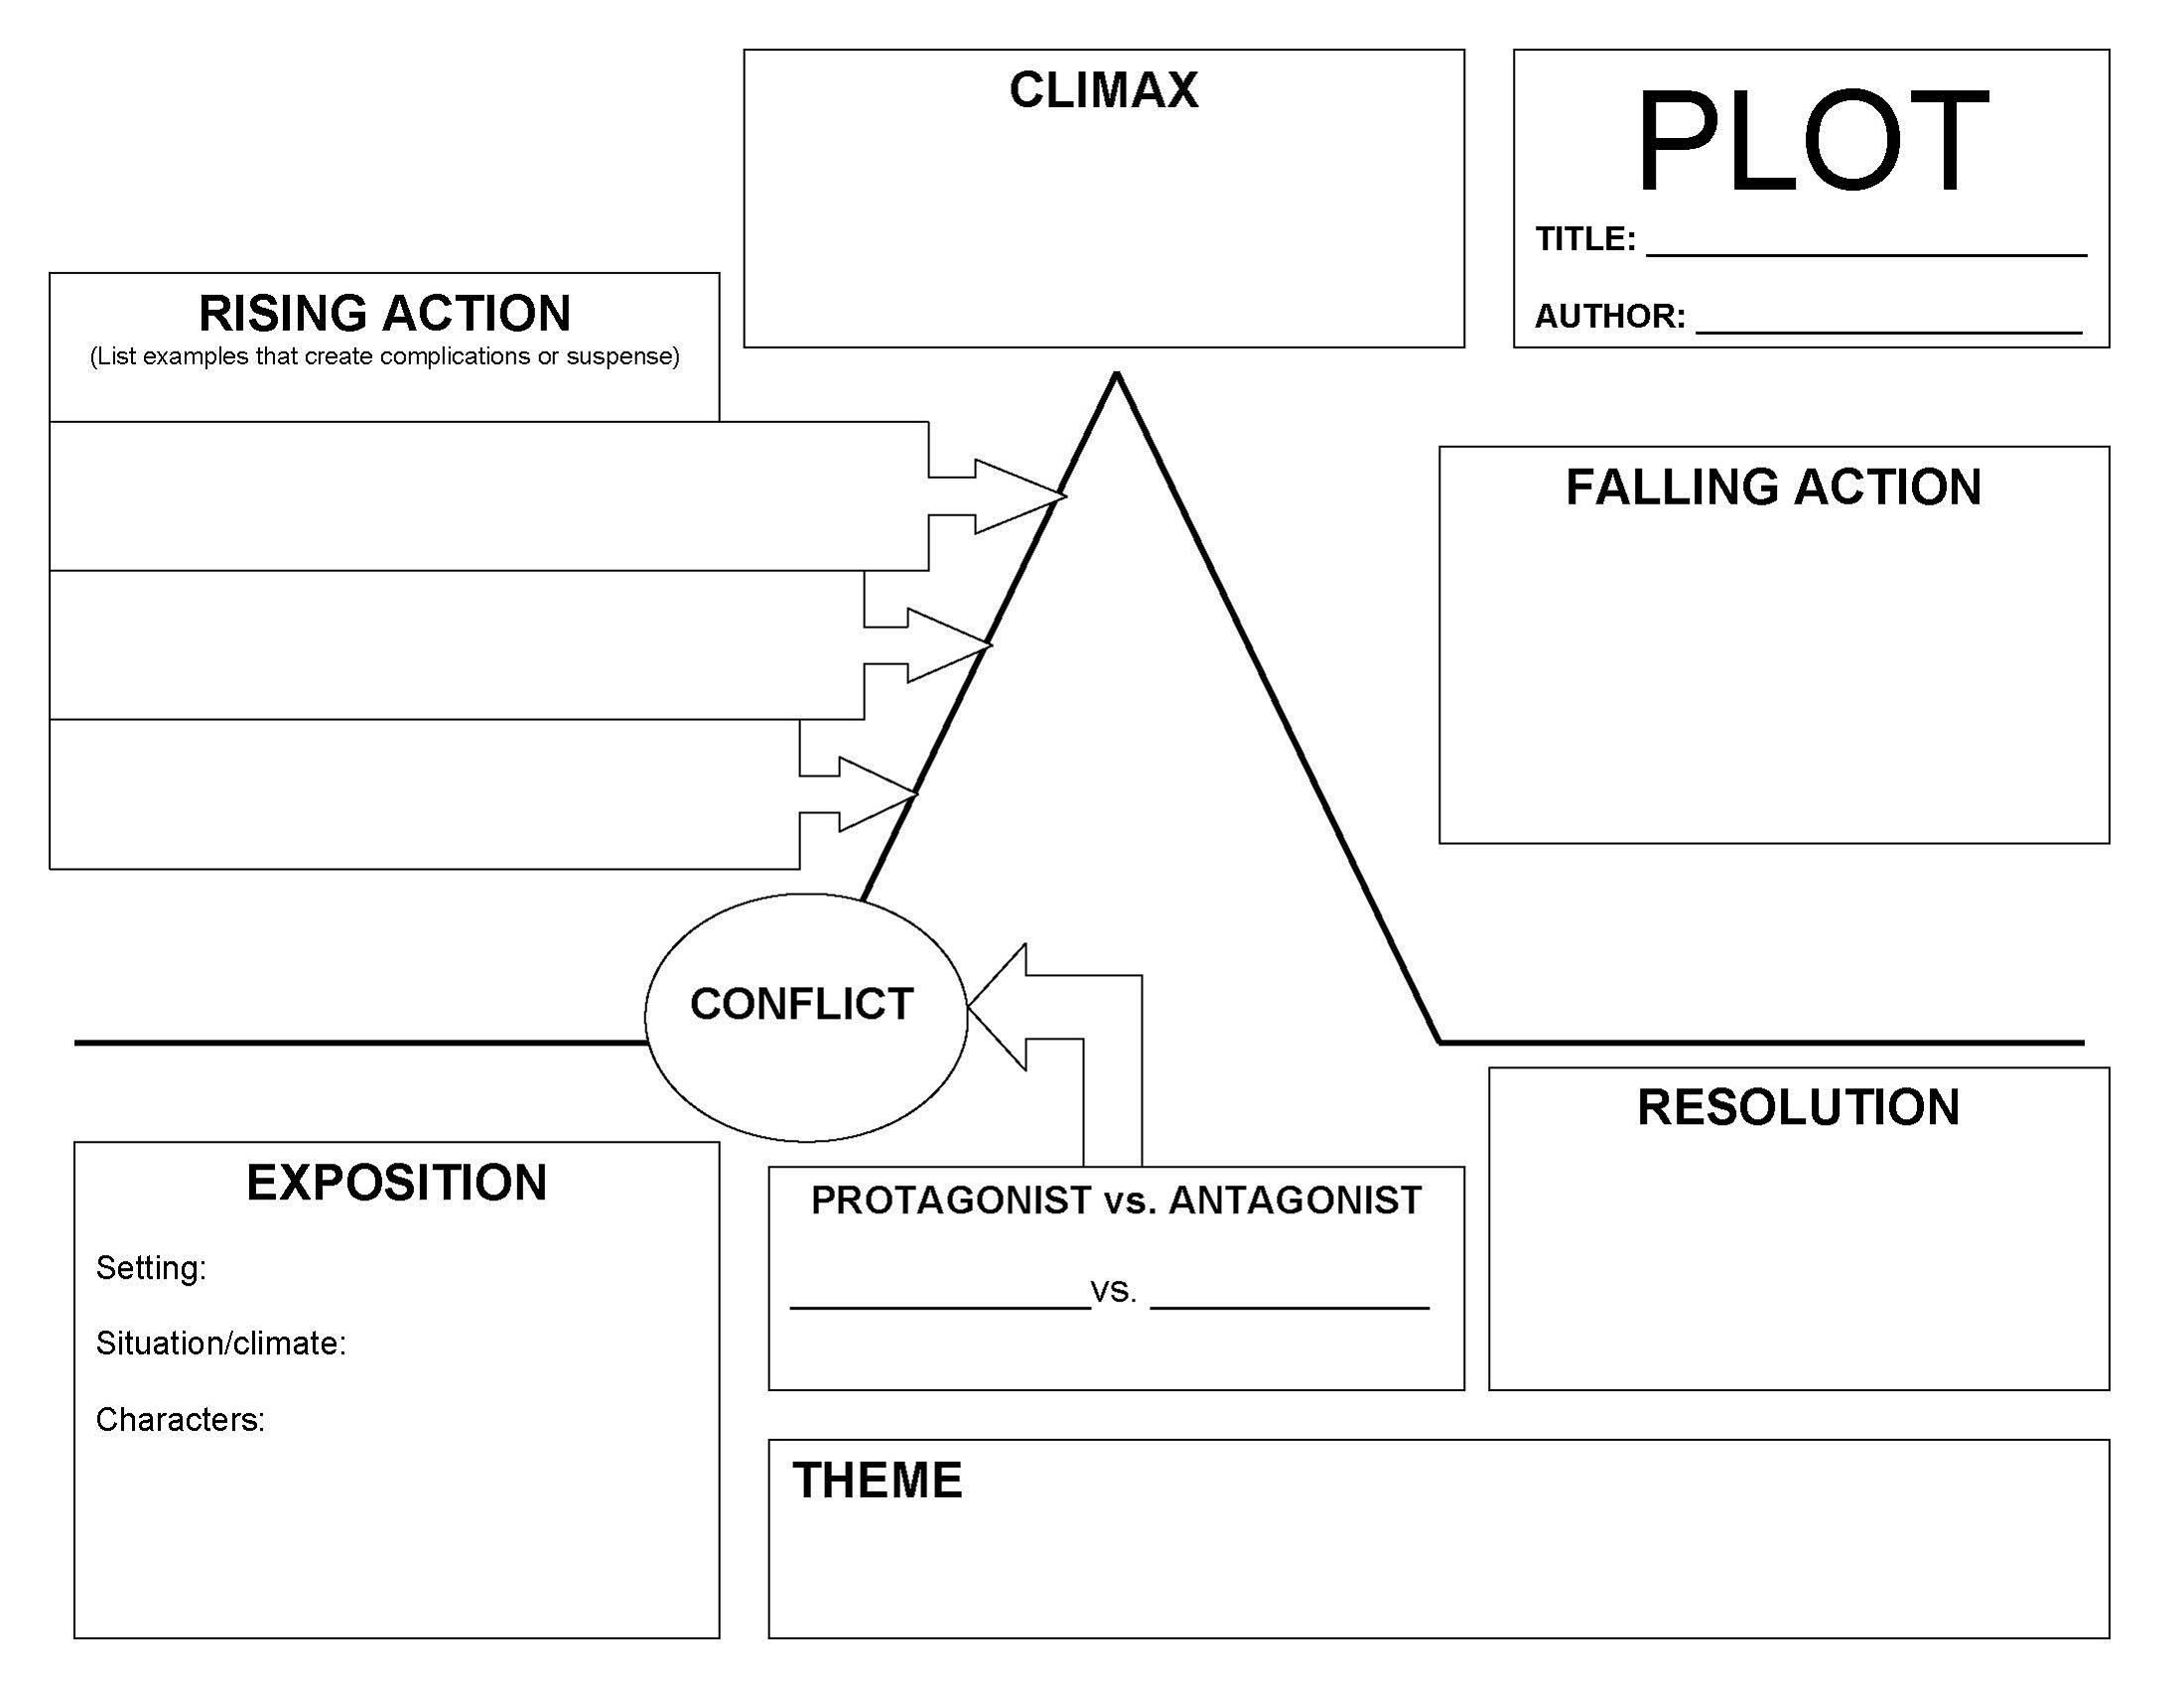 small resolution of blank plot diagram template printable diagram printable diagramblank plot diagram template printable diagram